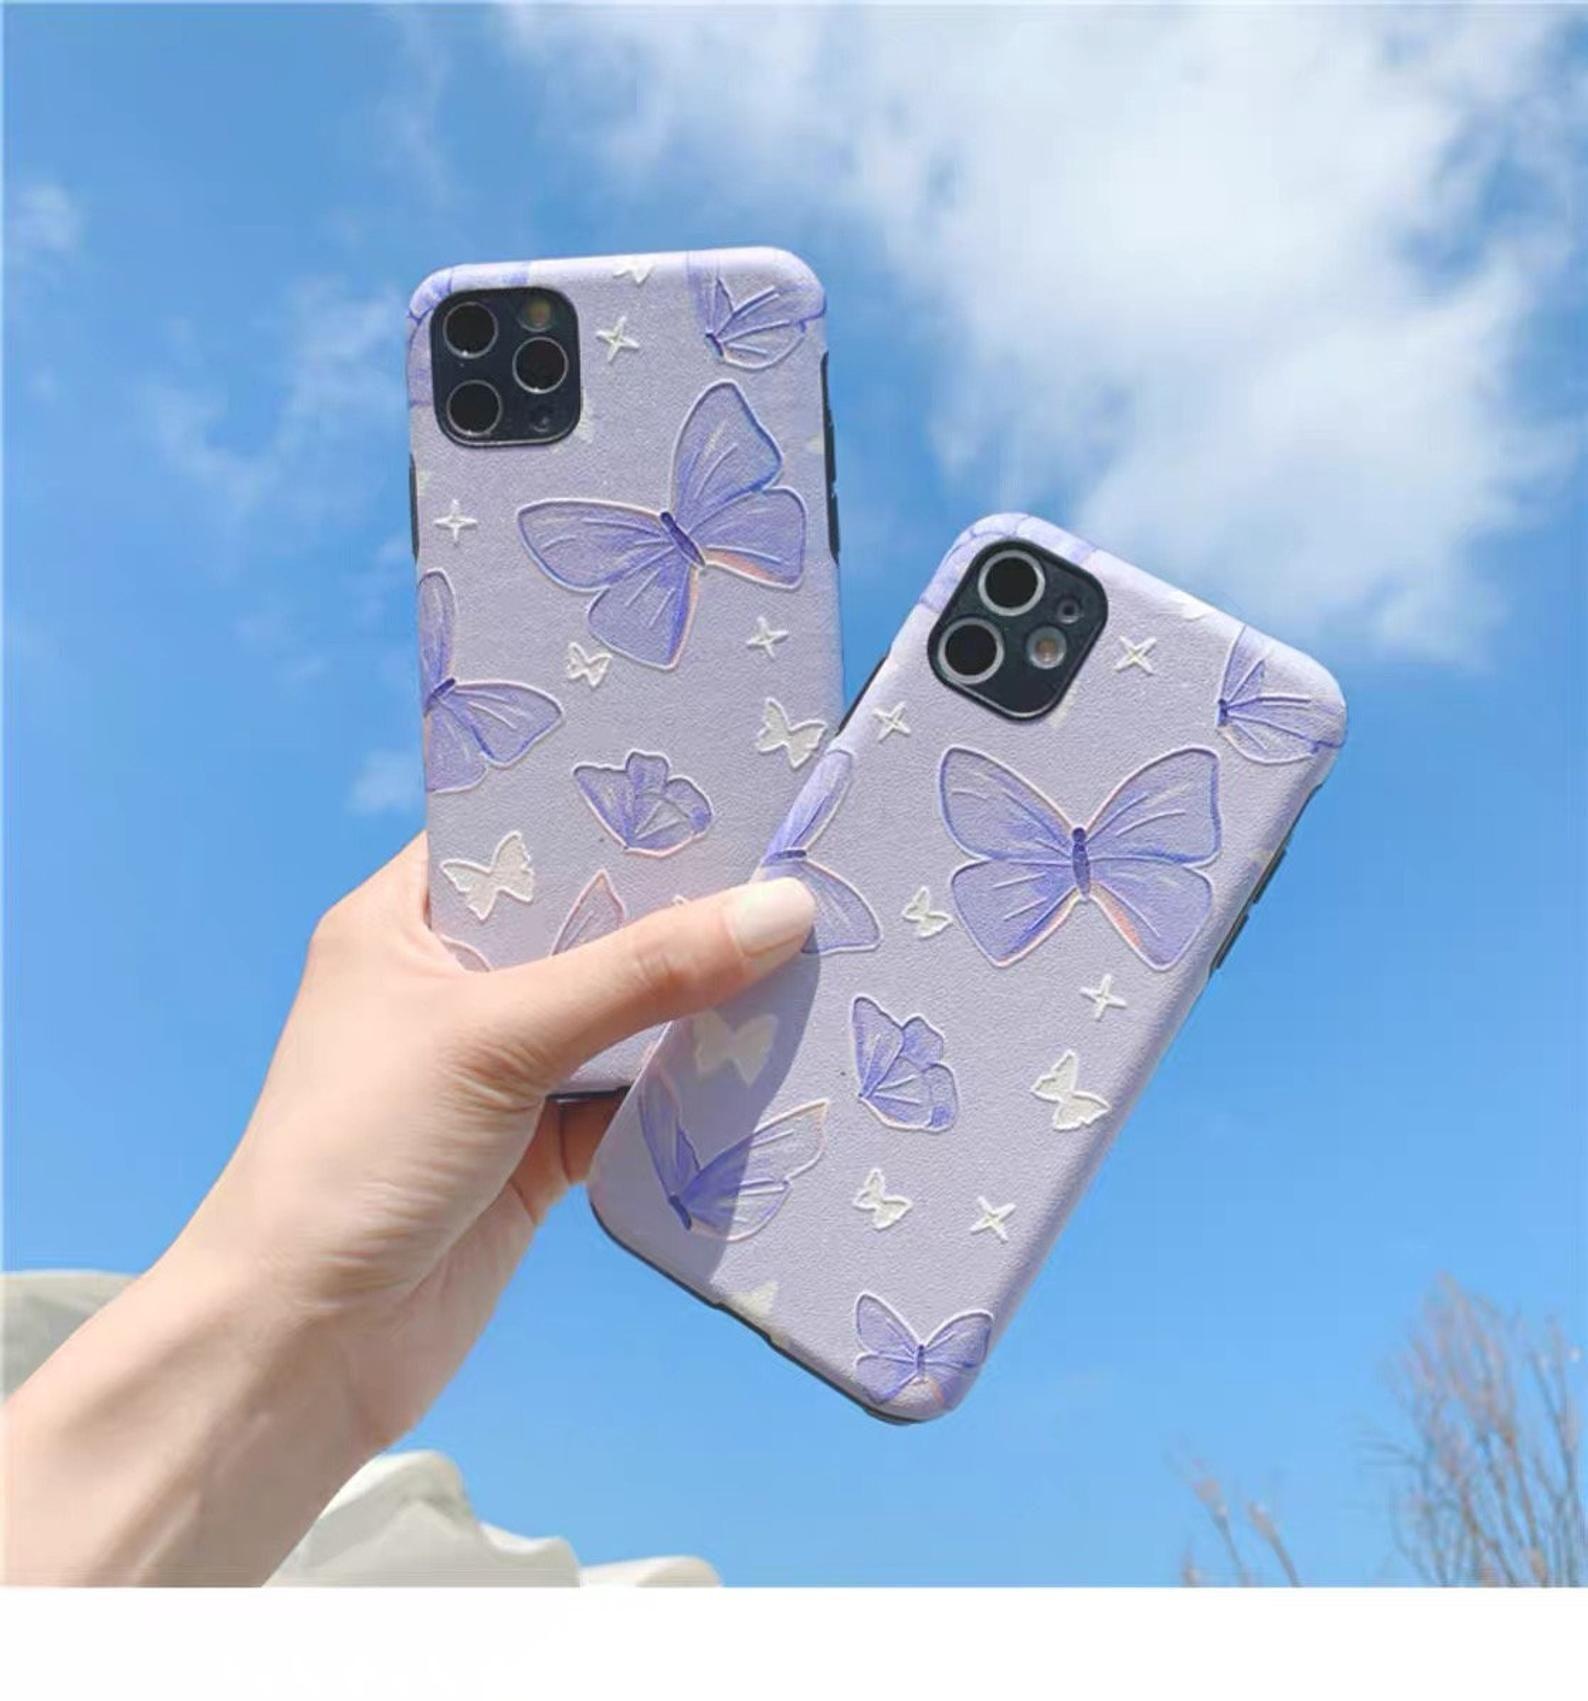 Light purple butterfly iphone pro casesummer floral